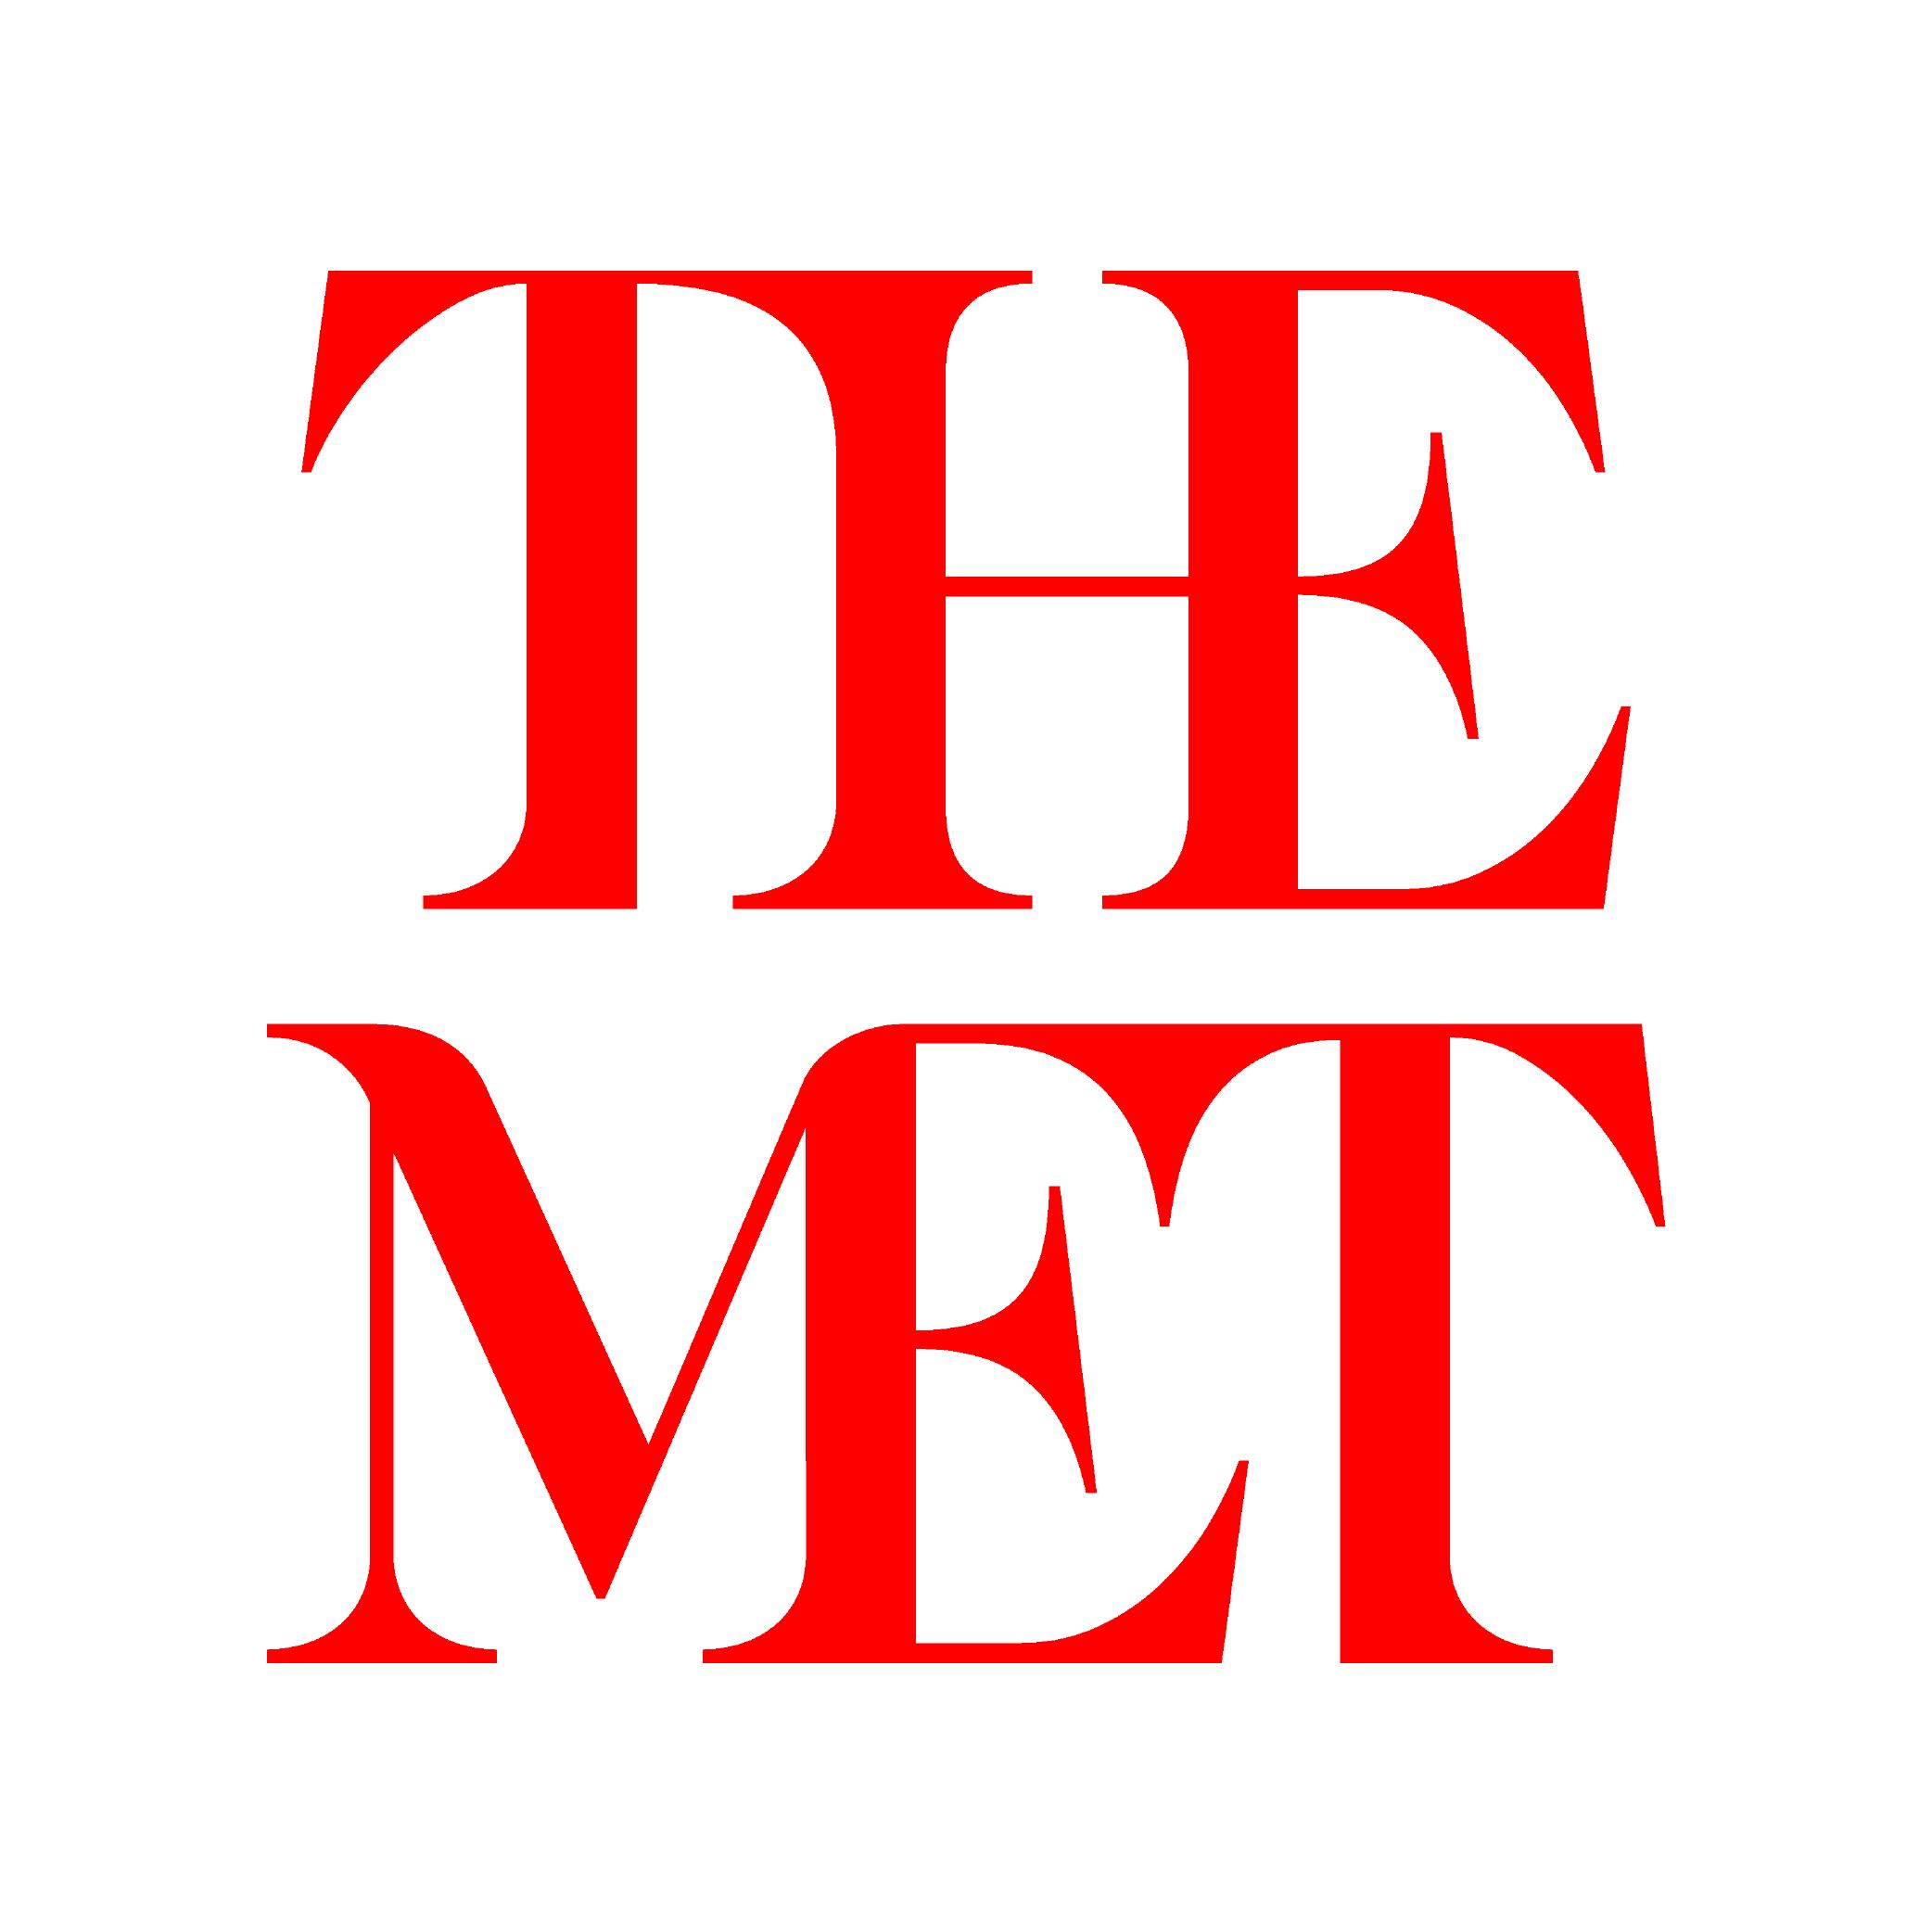 Logos-Formatted-Master-11